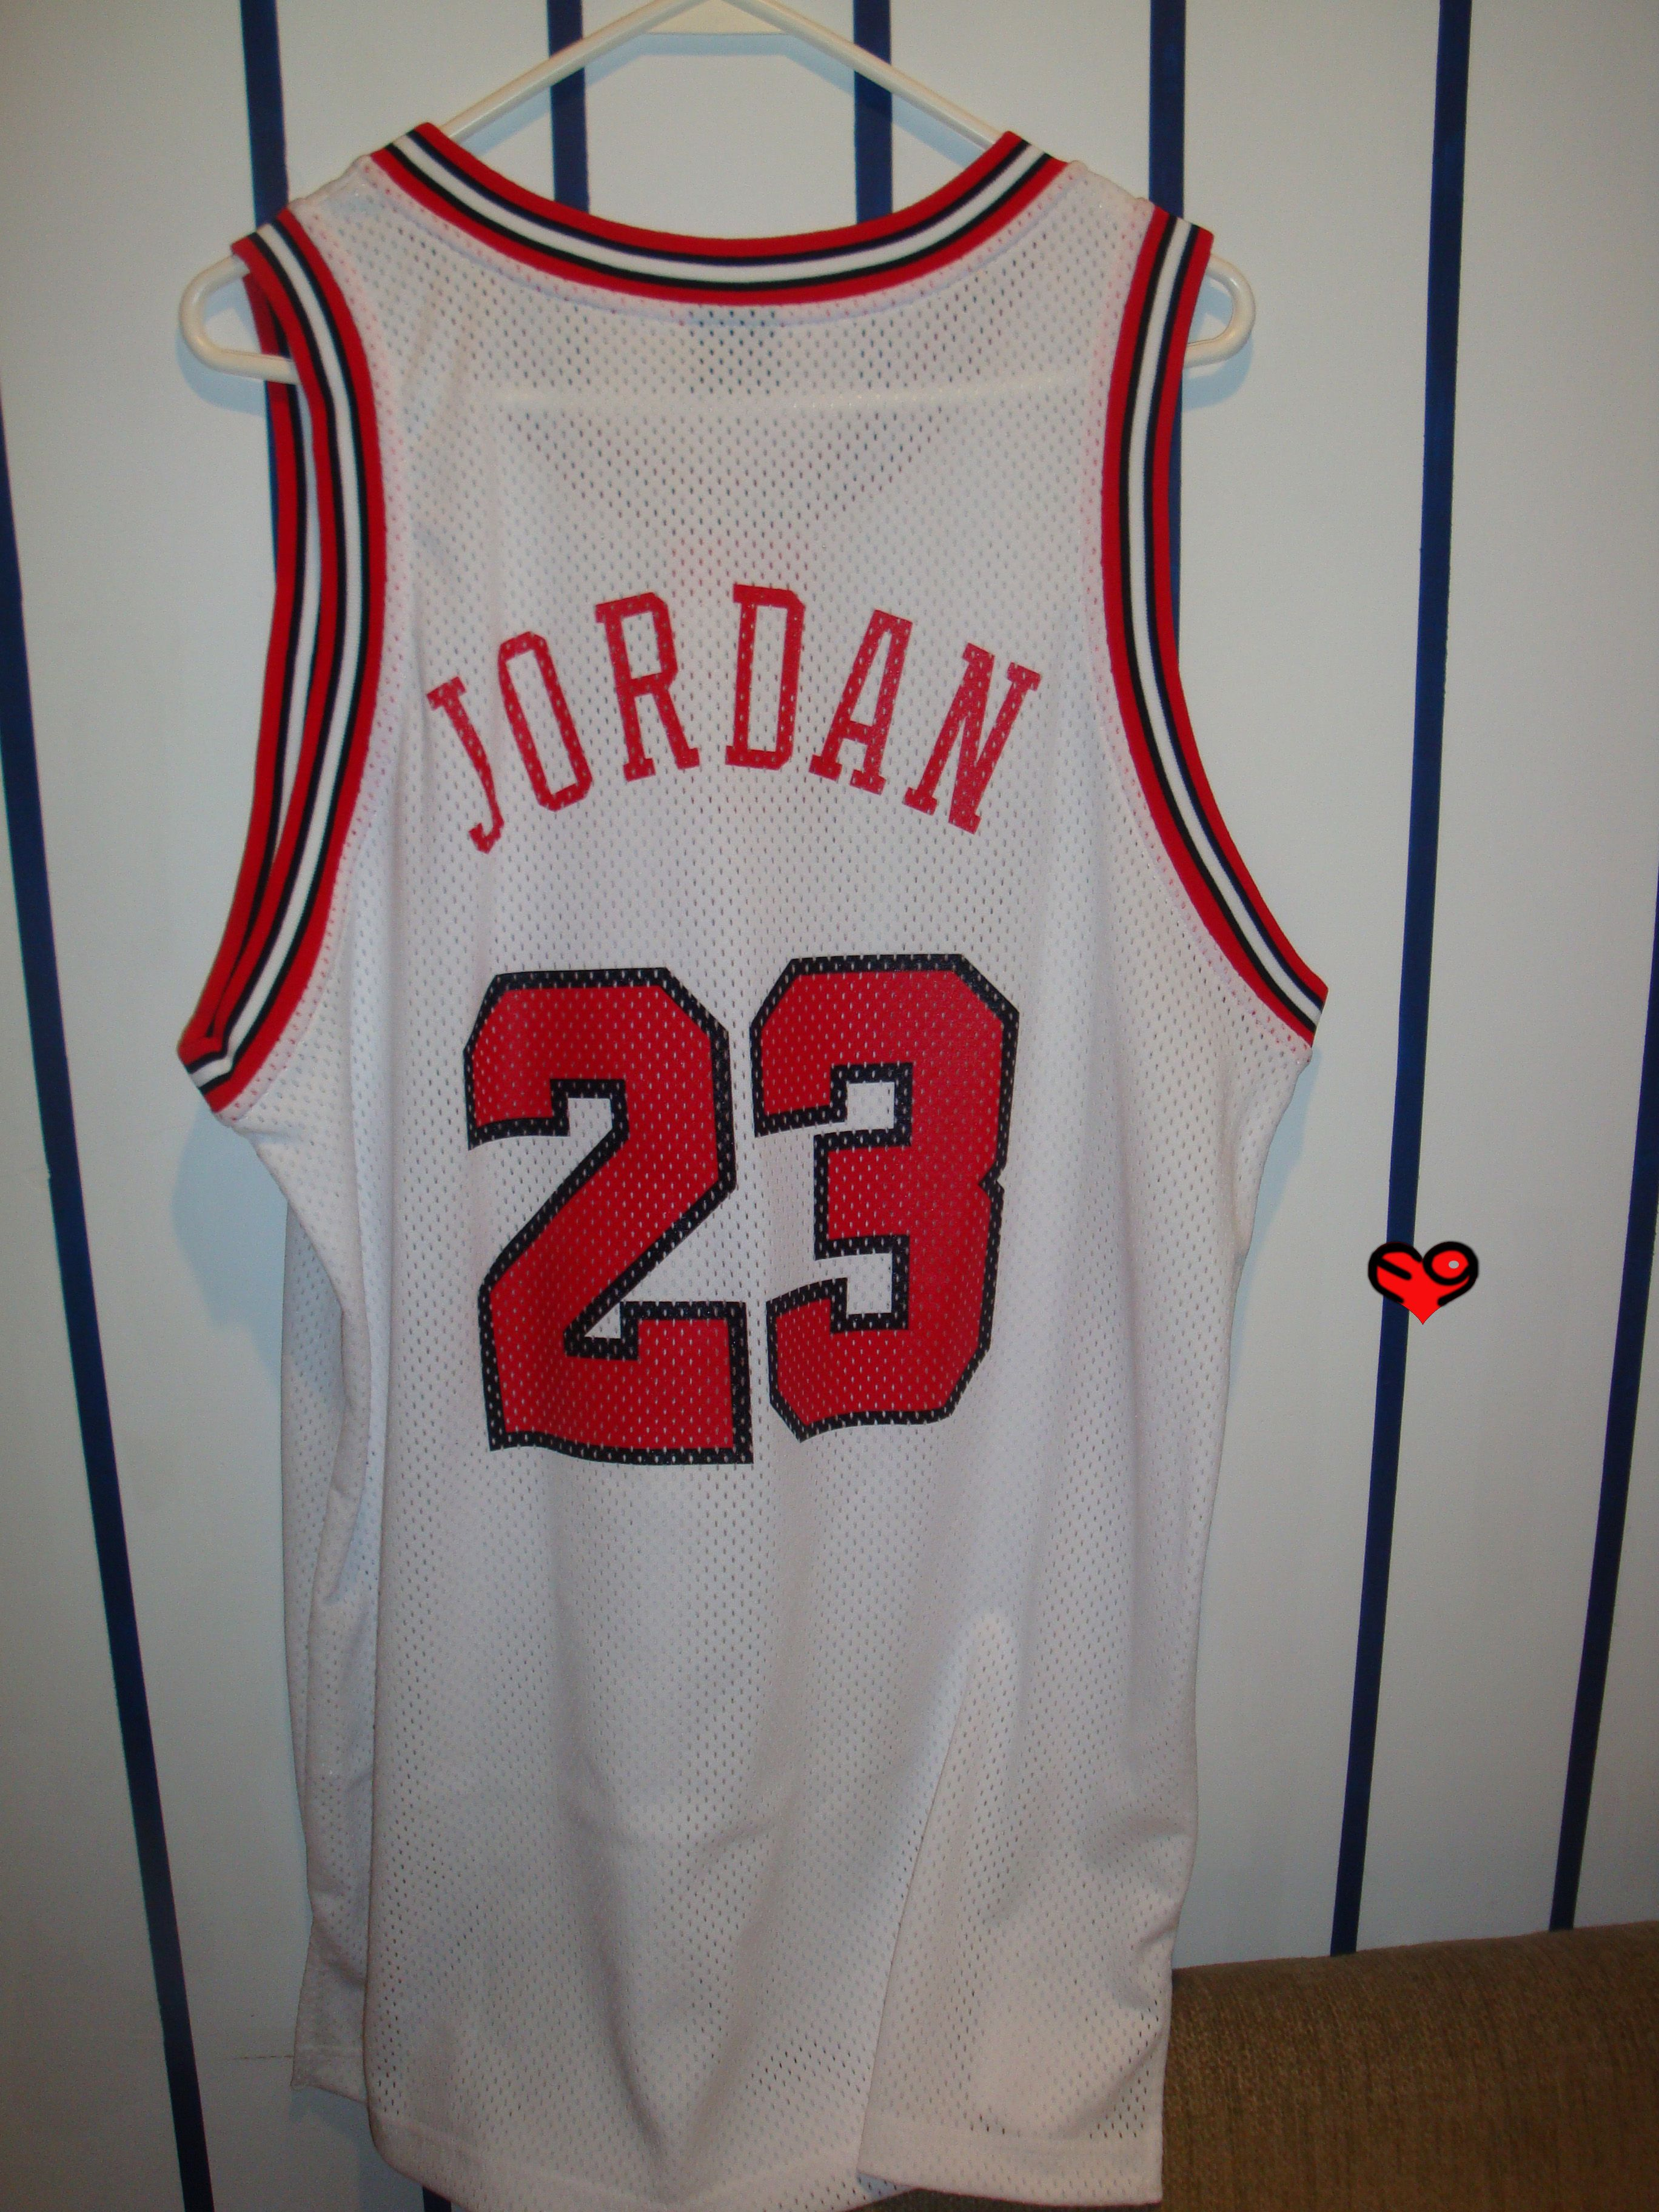 brand new 3c68a e2db4 Jordan